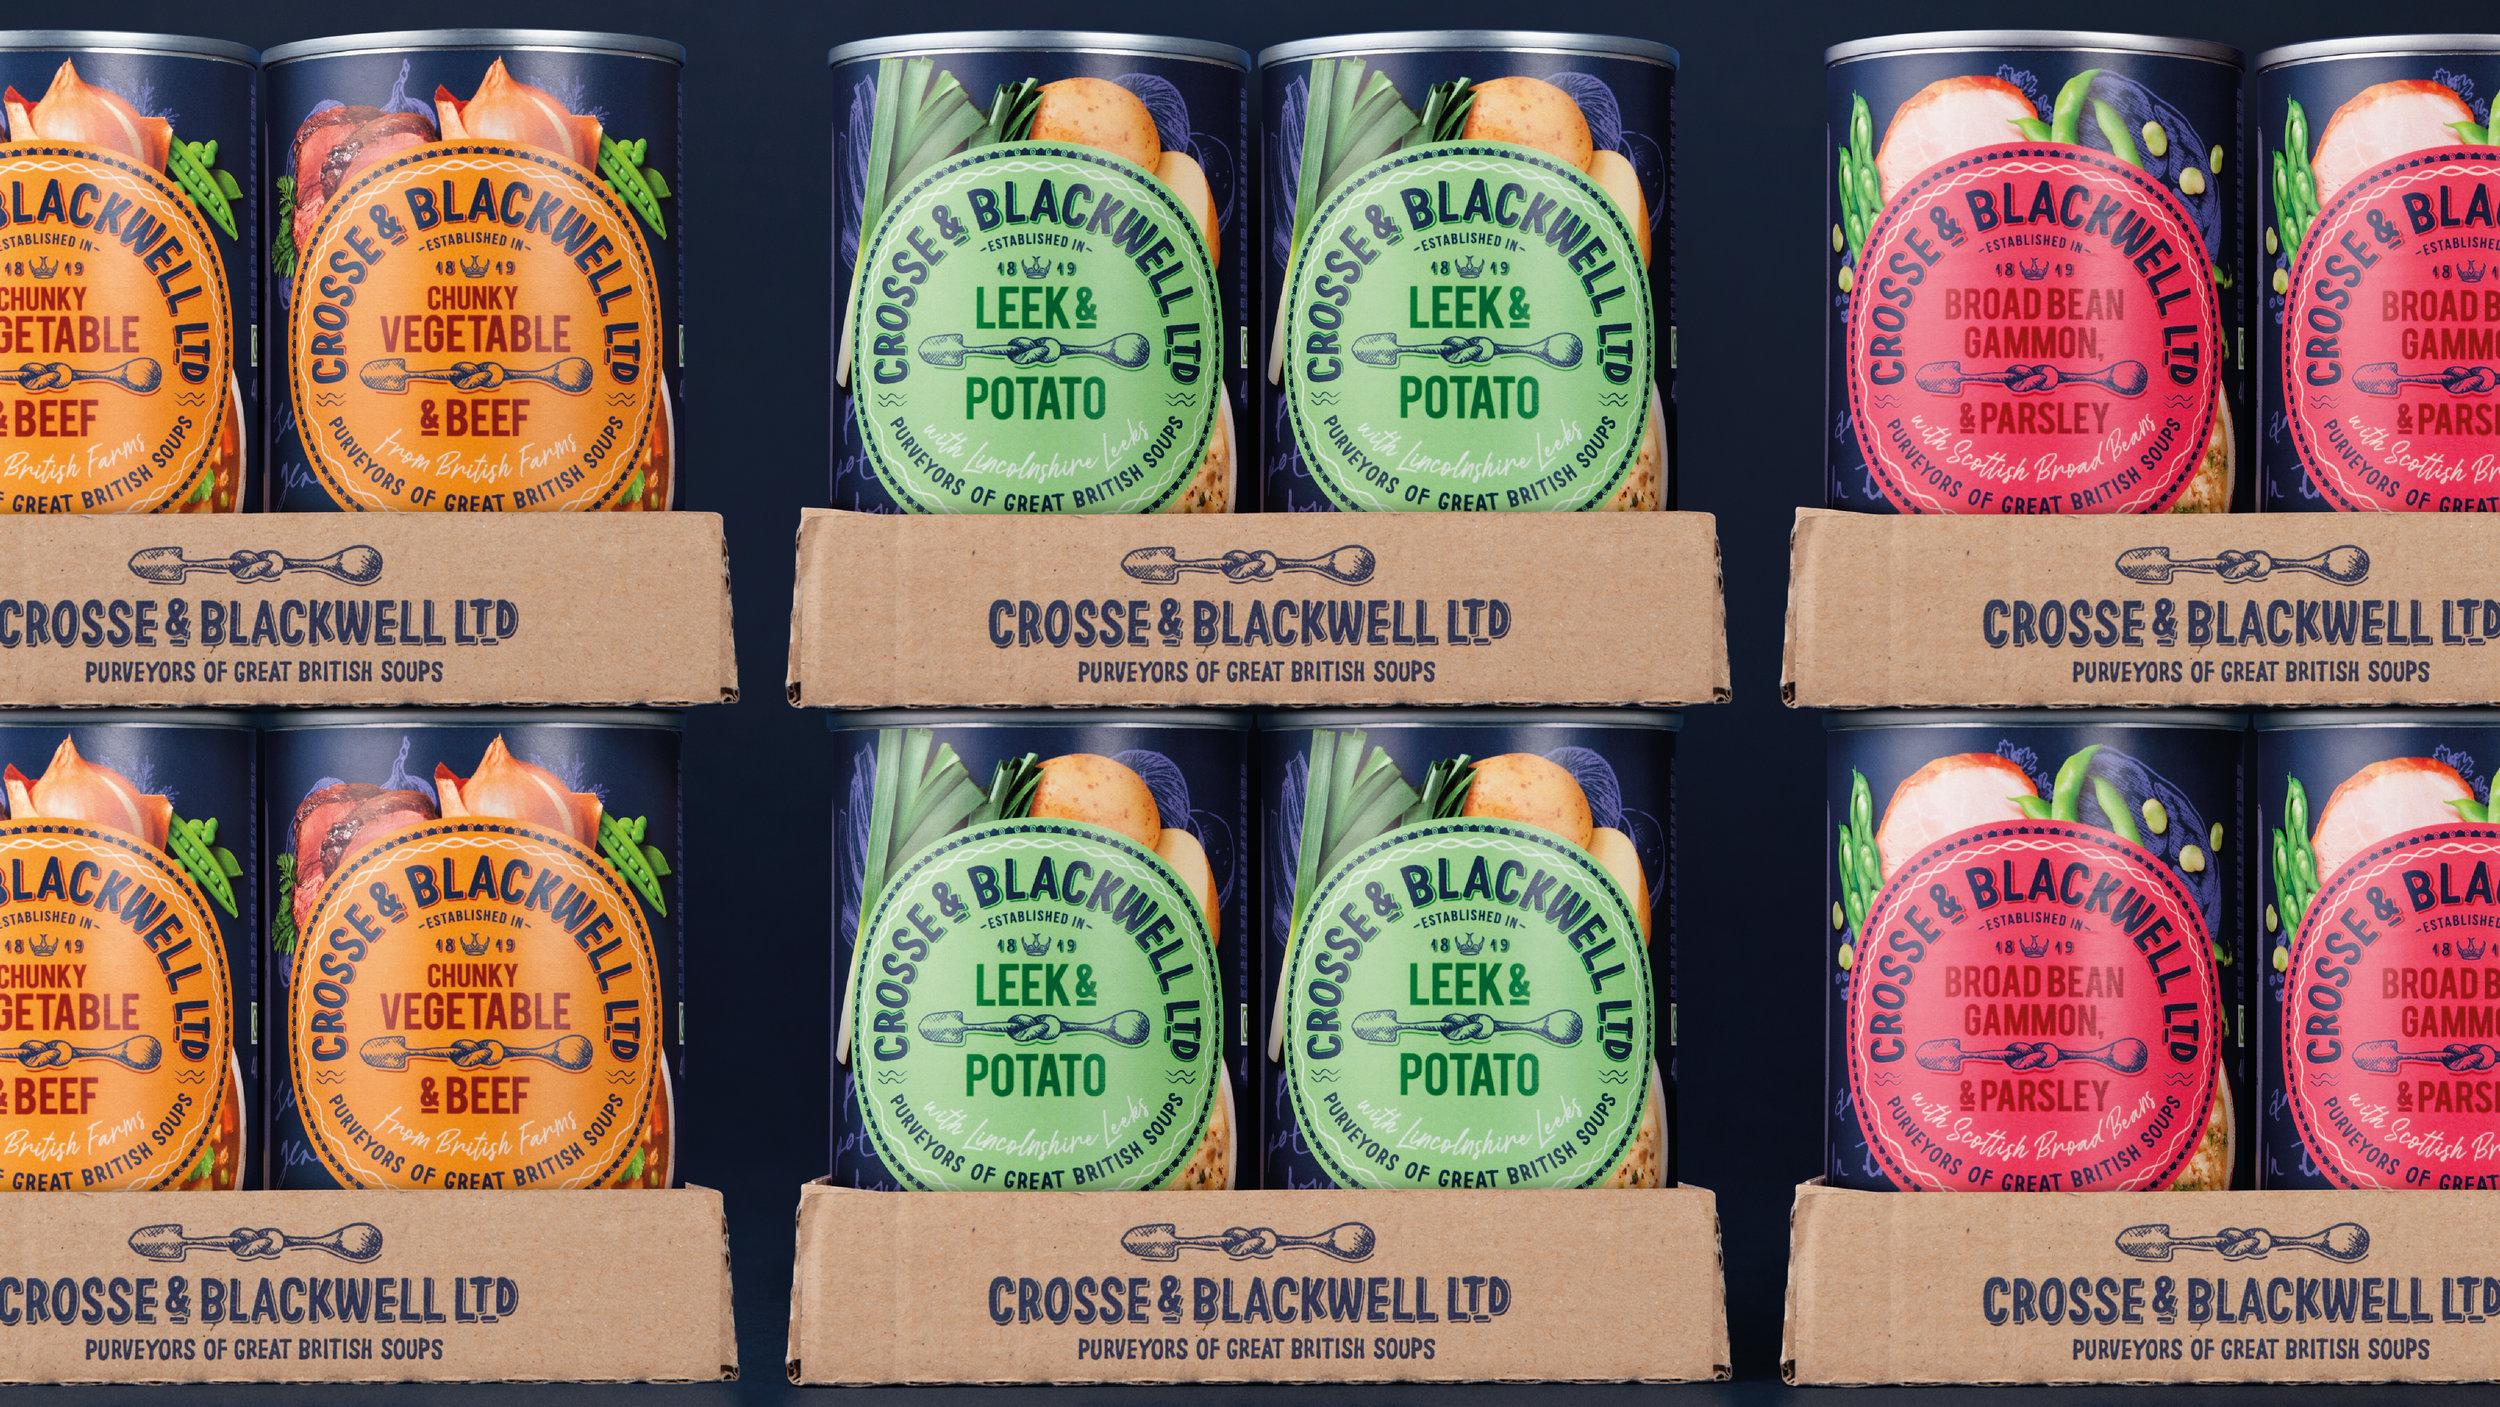 Rebrand for Crosse & Blackwell Celebrates the Perfect Partnership / World Brand Design Society